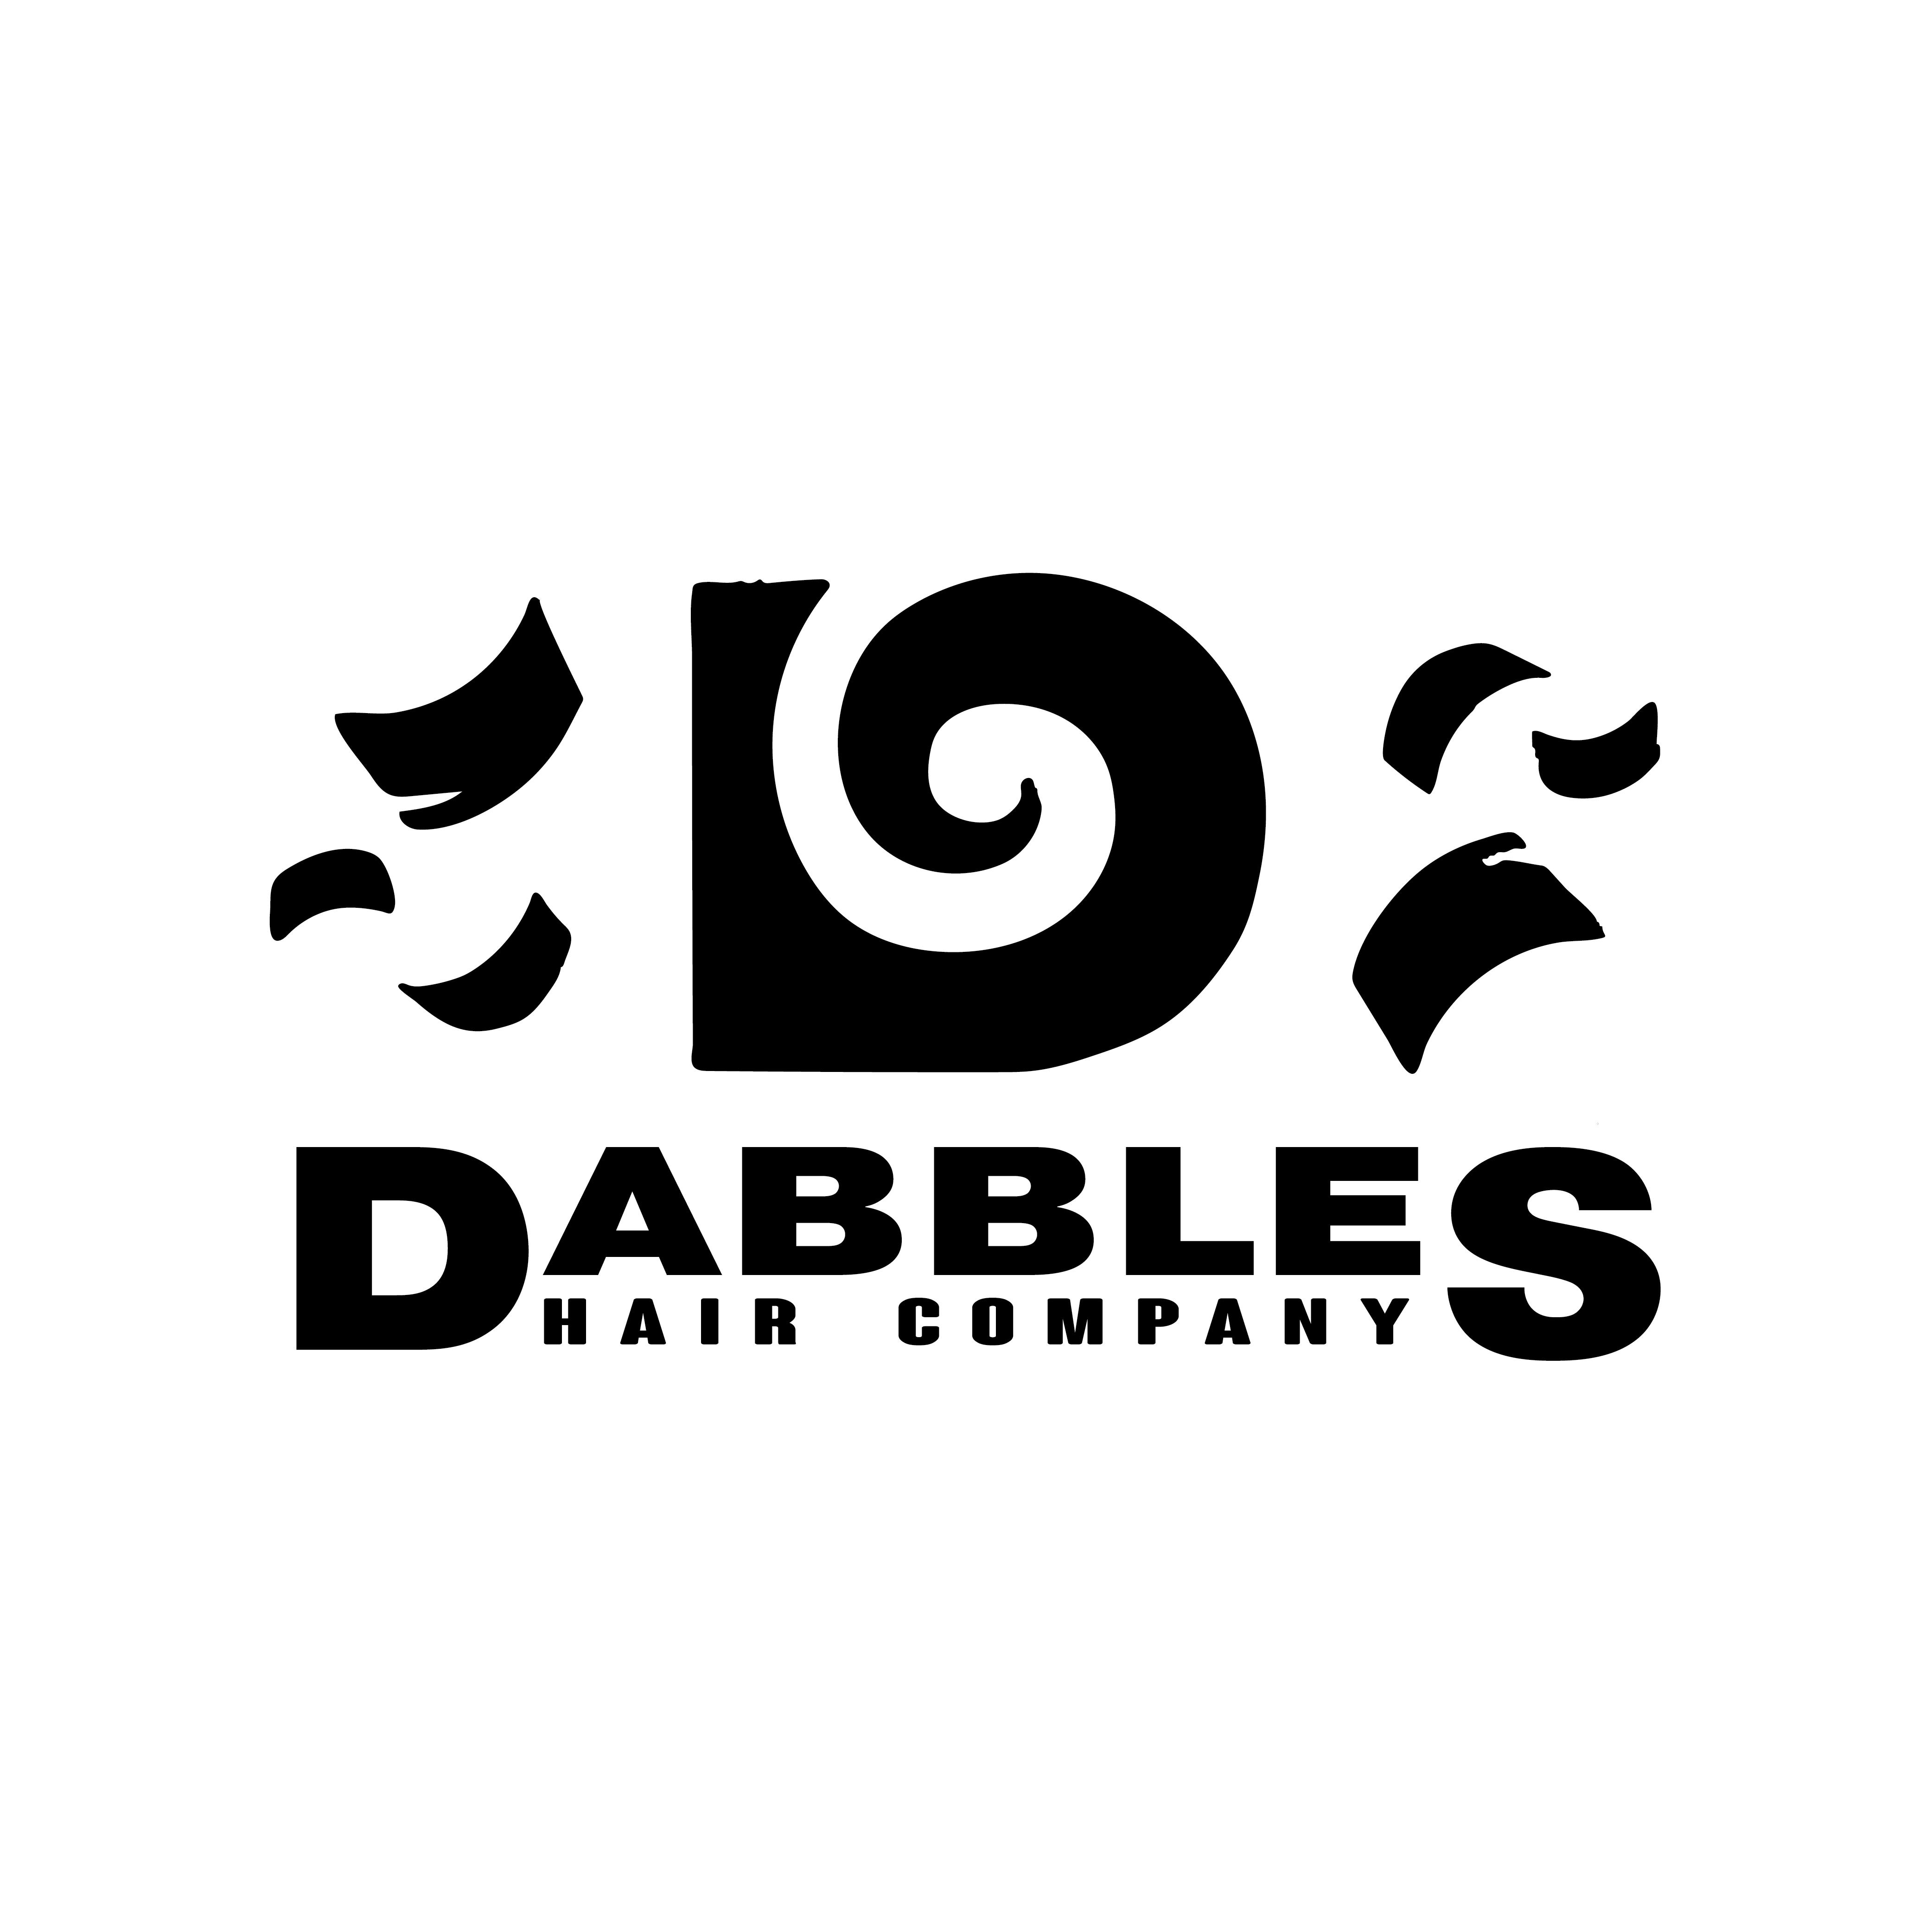 Dabbles